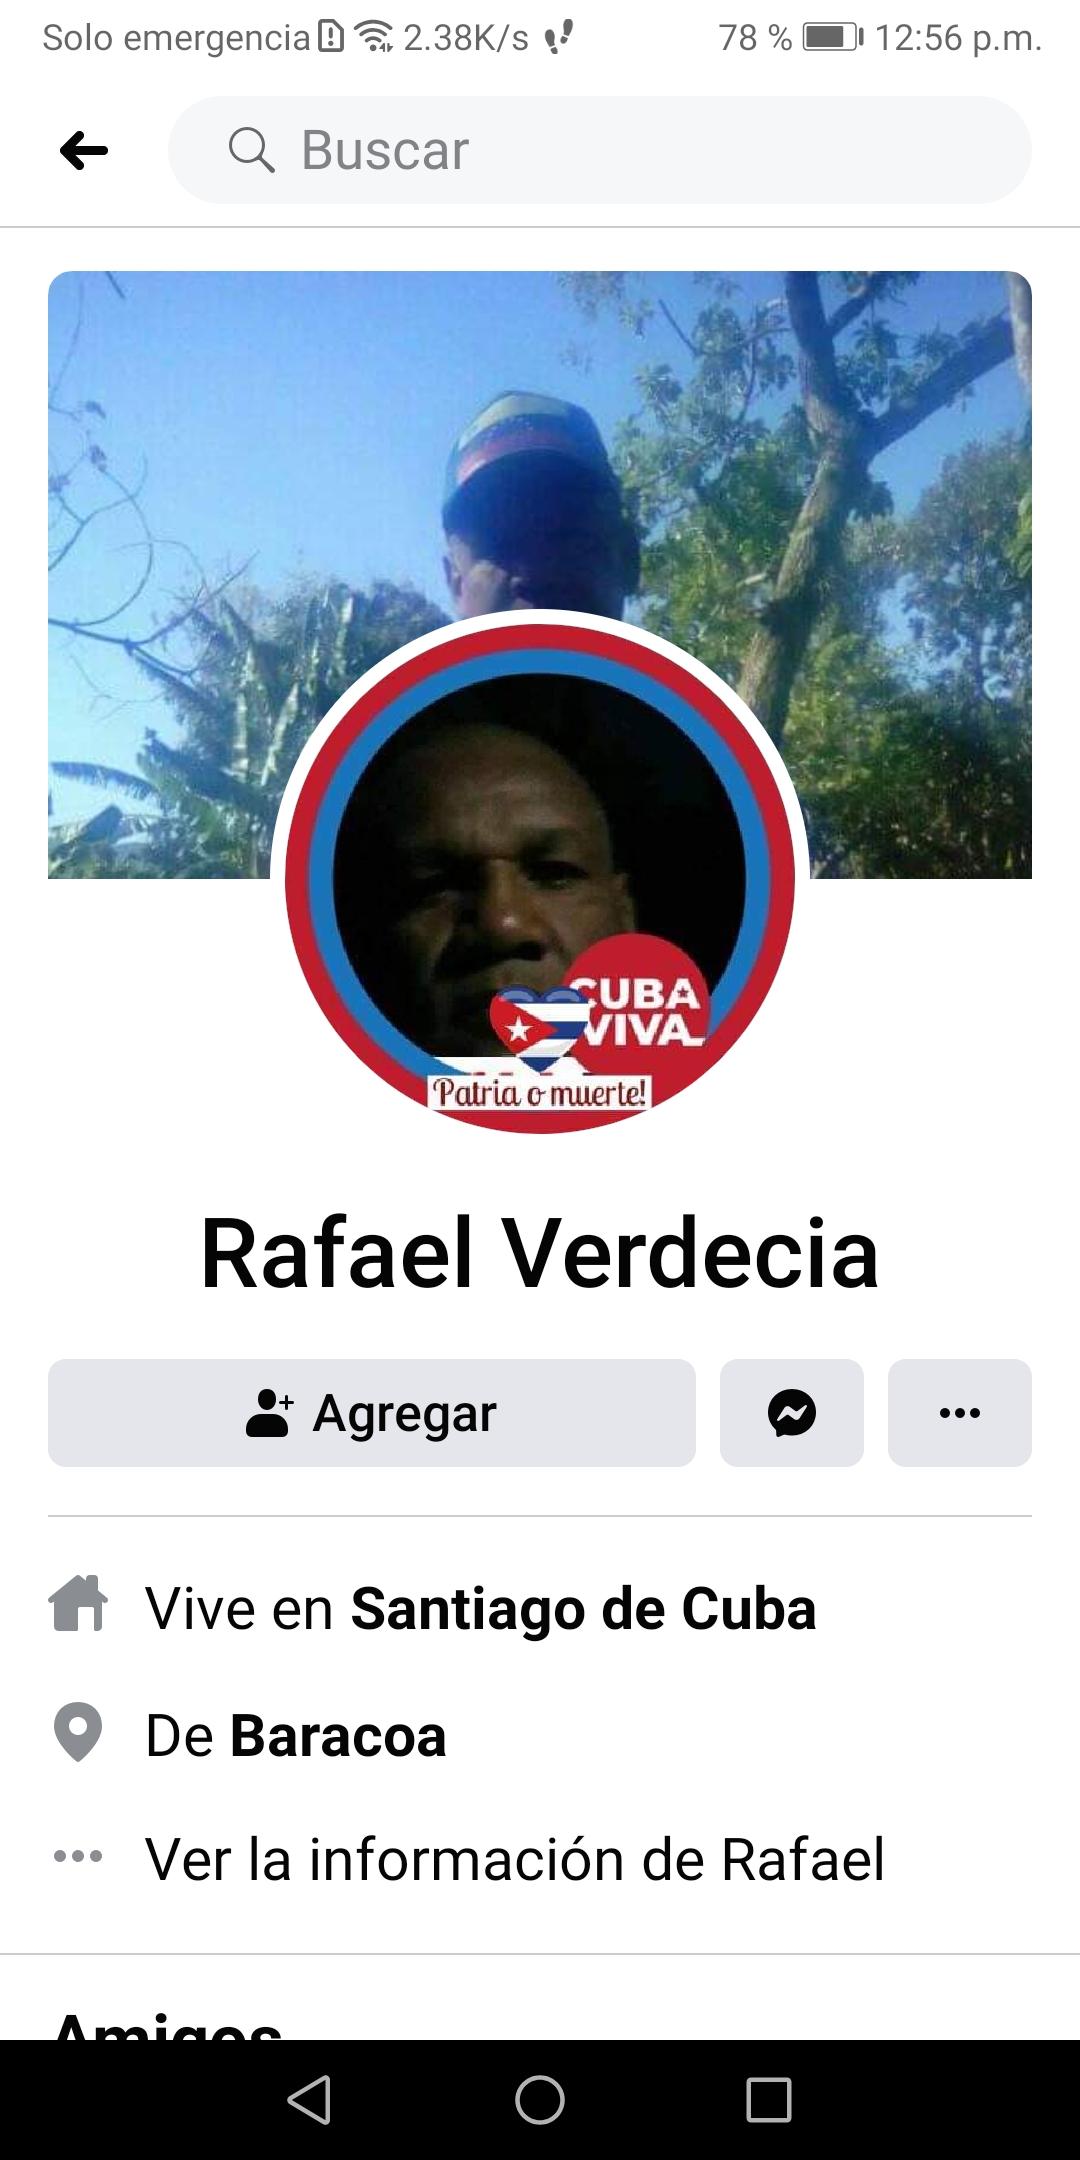 Rafael verdecia